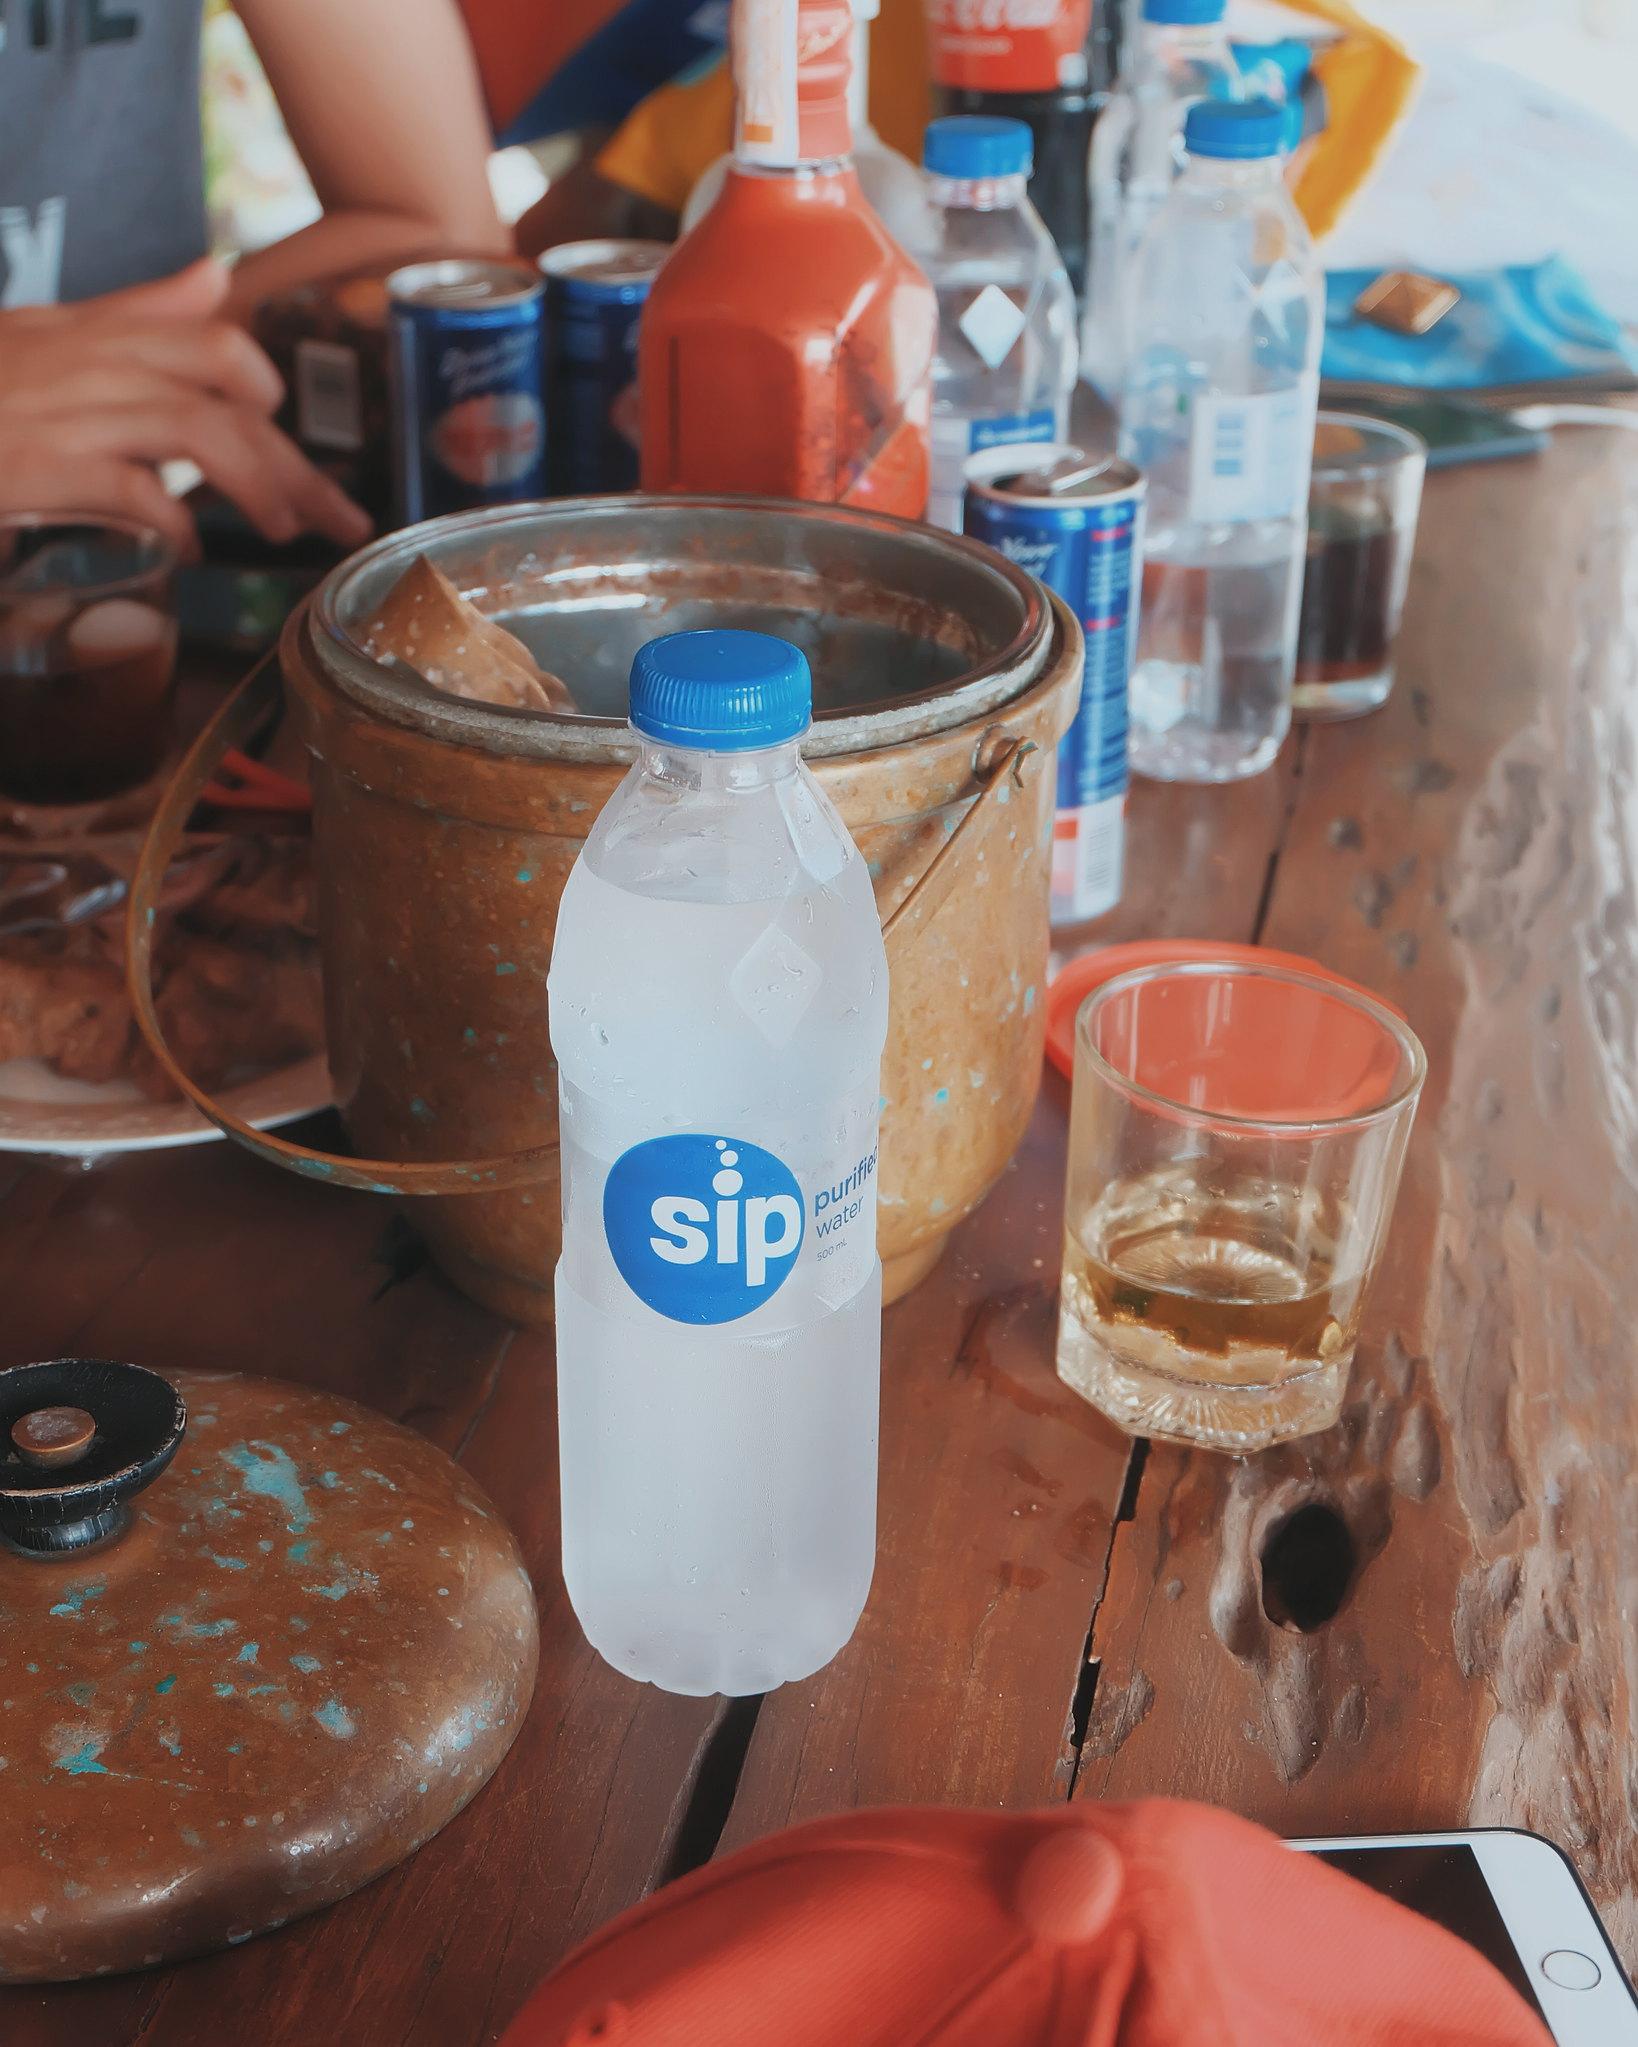 sip water